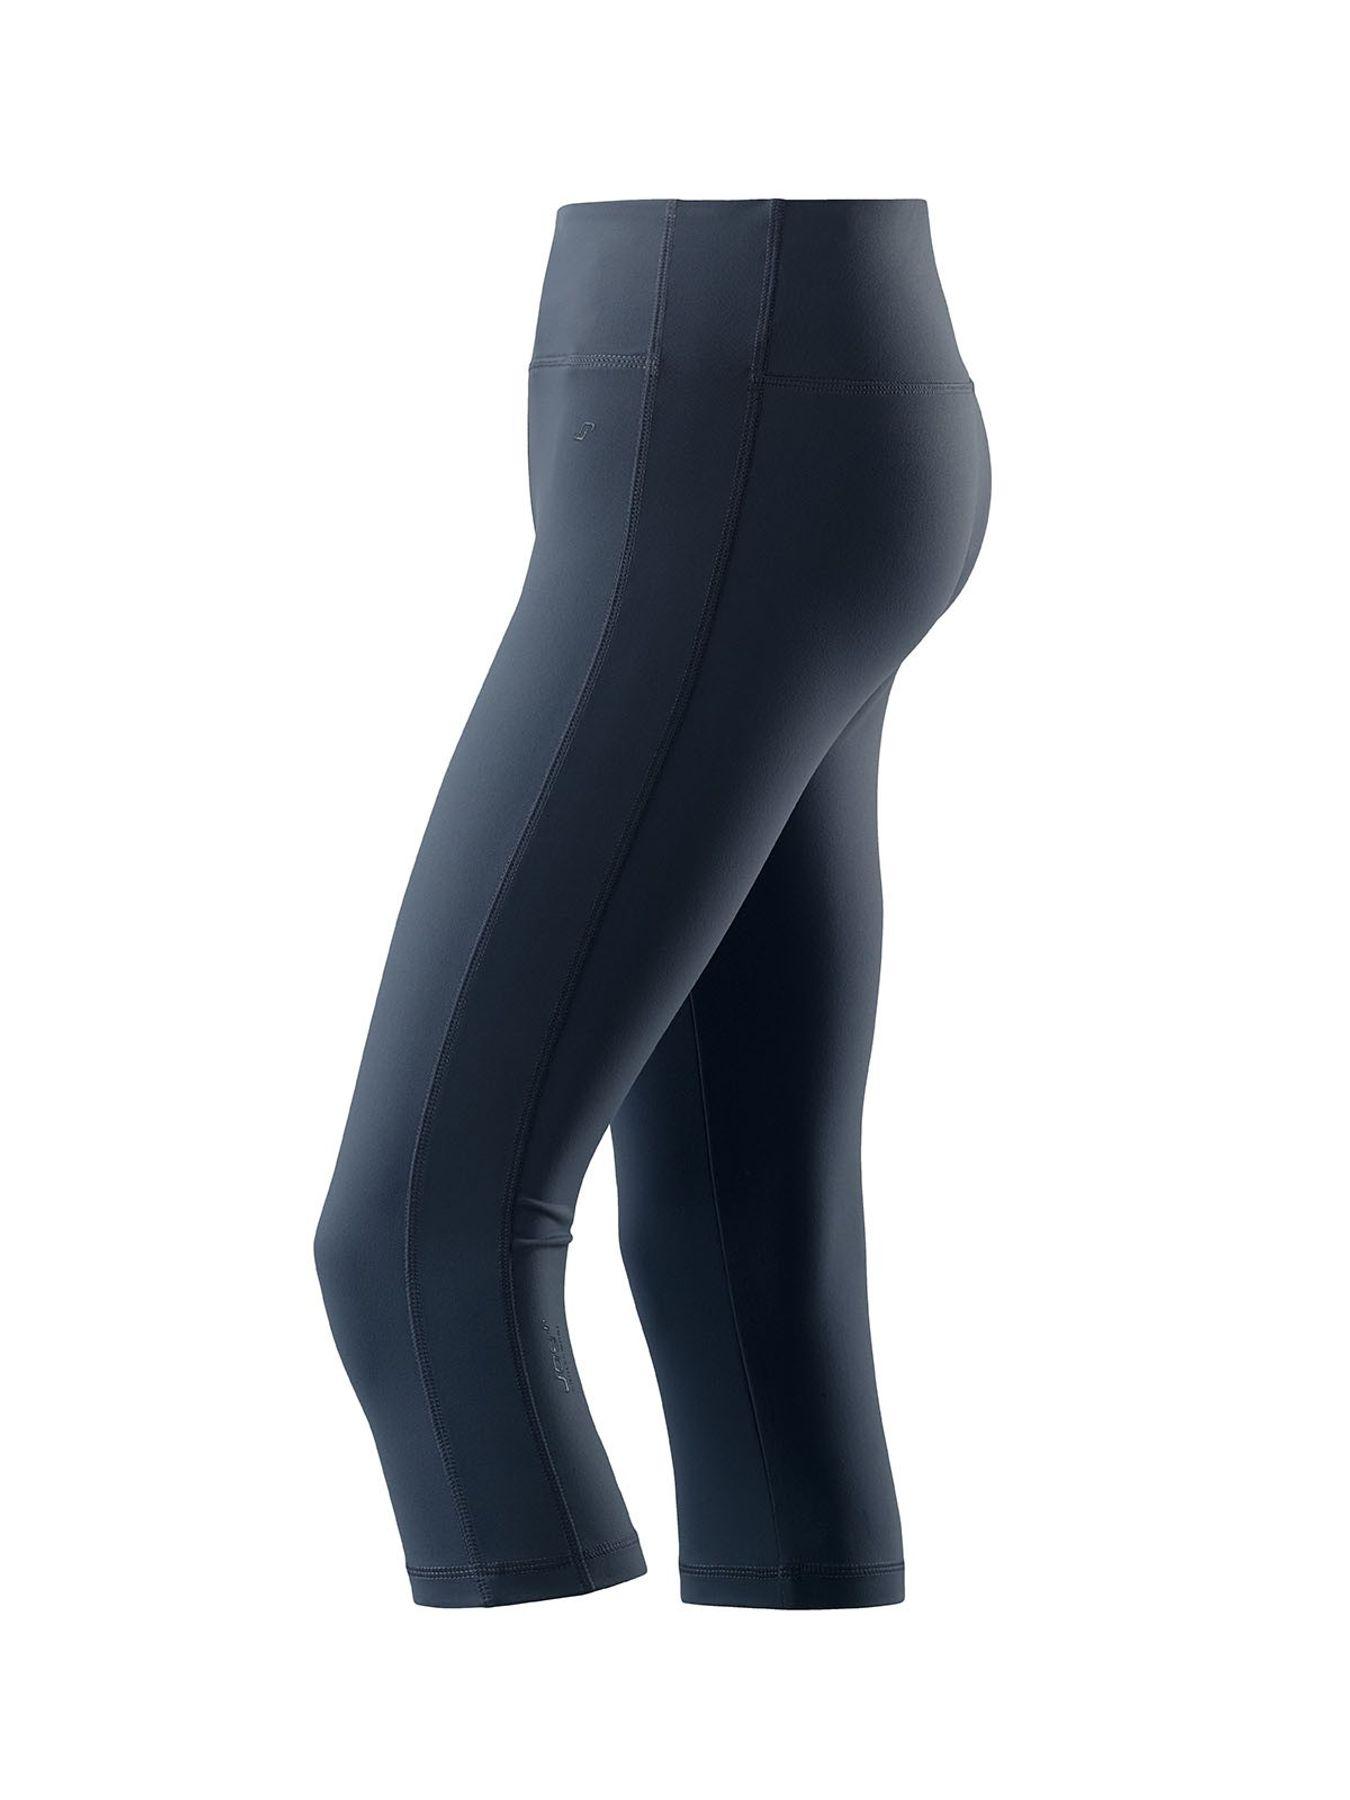 Joy - Bodyfit - Damen 3/4 Hose mit Shaping-Effekt, Susanna (30142) – Bild 2